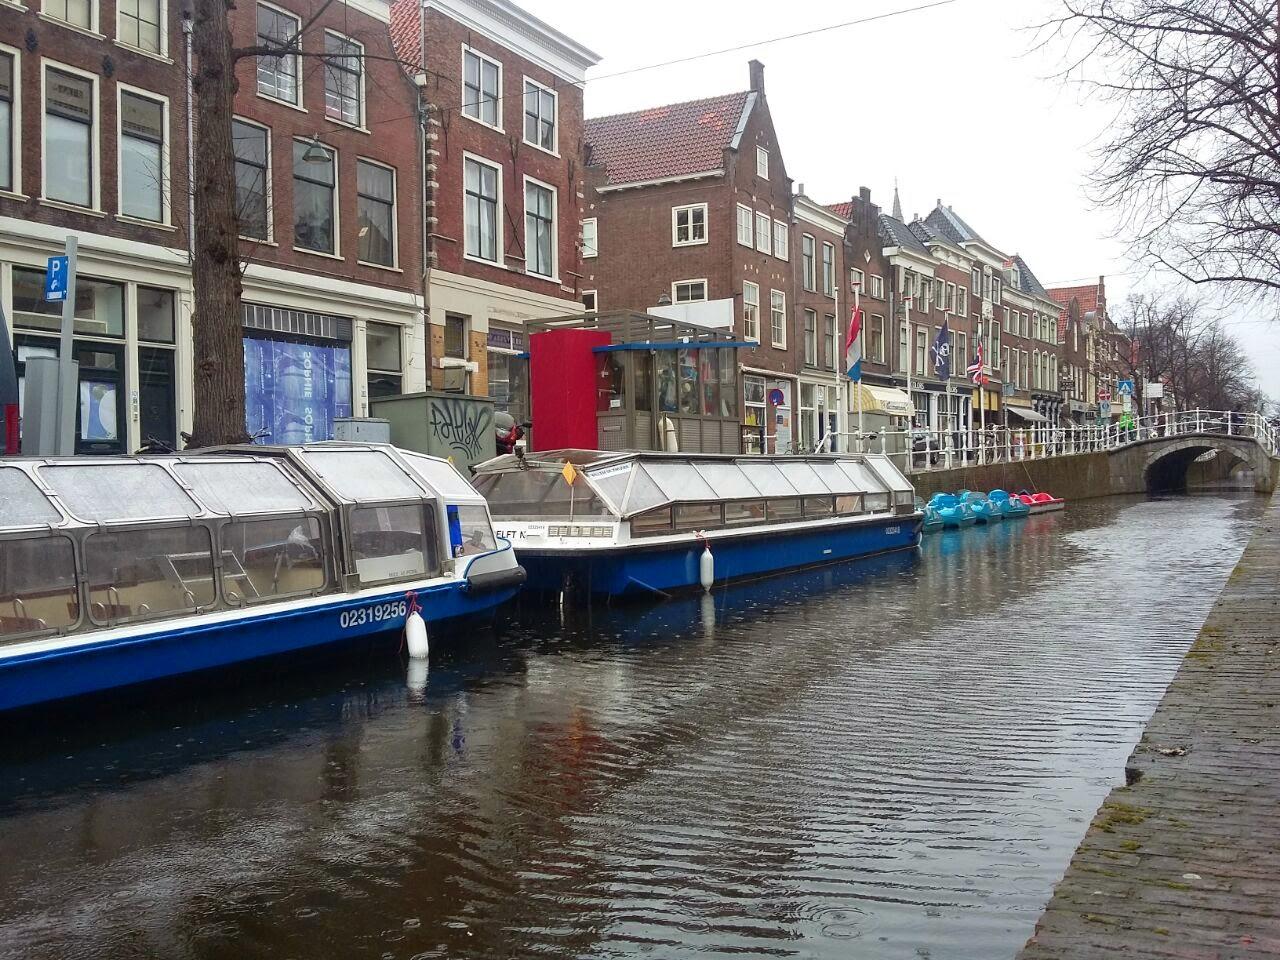 Salah satu sudut kota Delft, Belanda